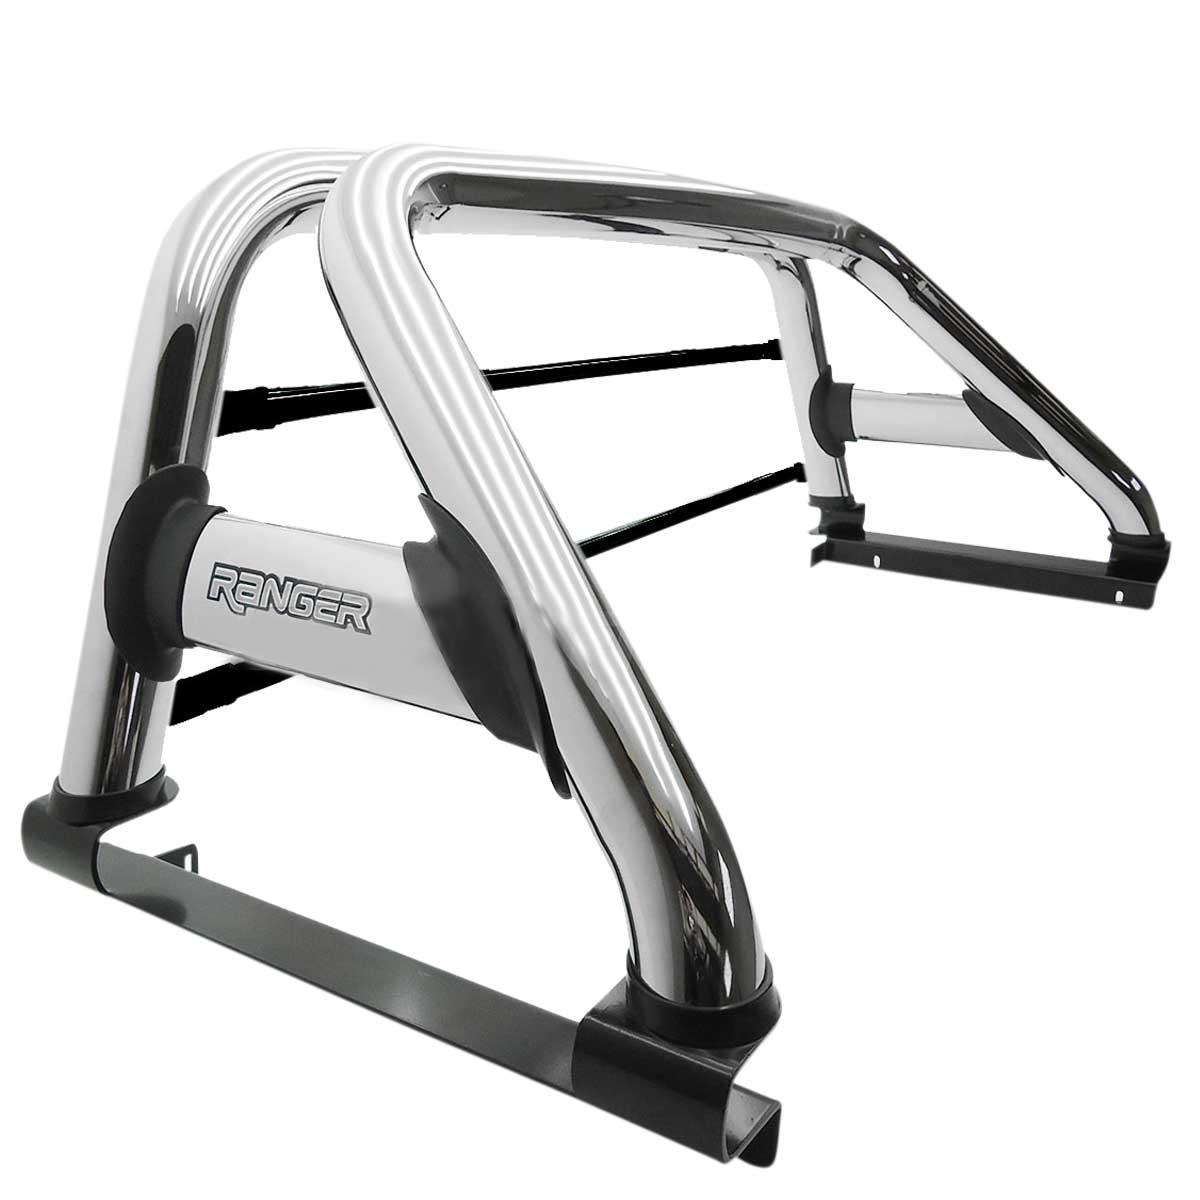 Santo antônio duplo cromado Nova Ranger 2013 a 2018 com barras de vidro